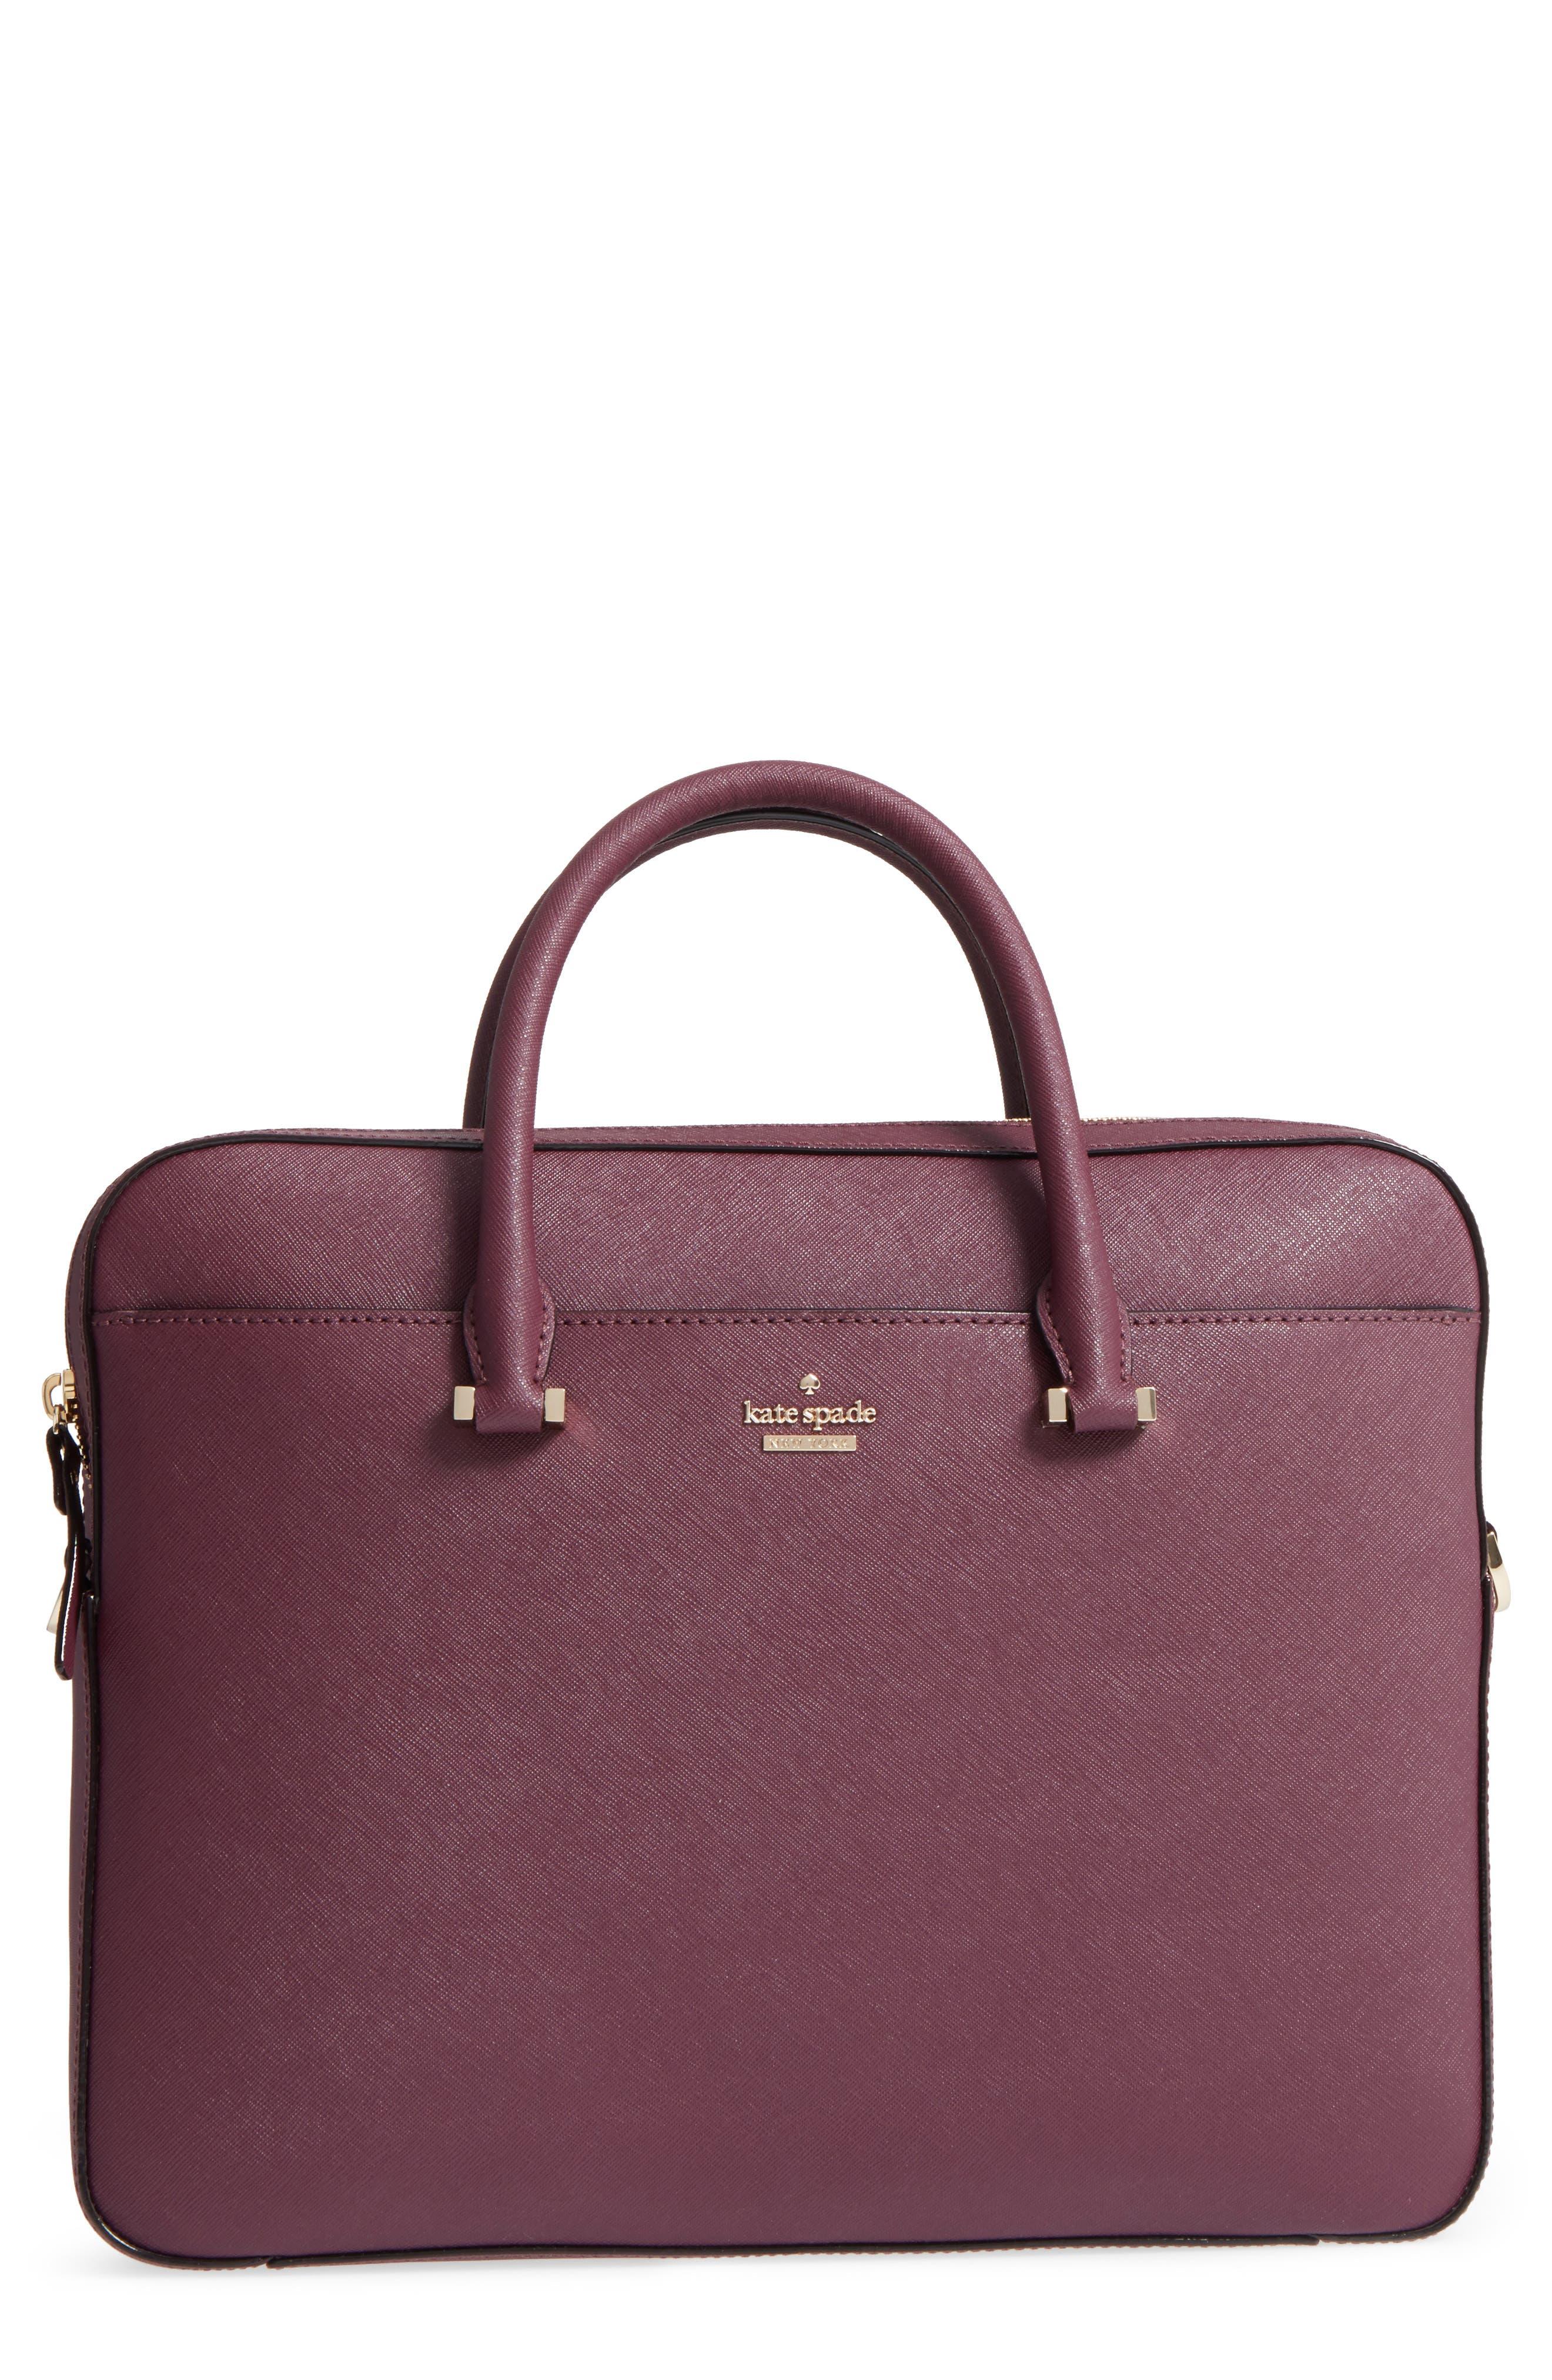 Main Image - kate spade new york saffiano leather laptop bag